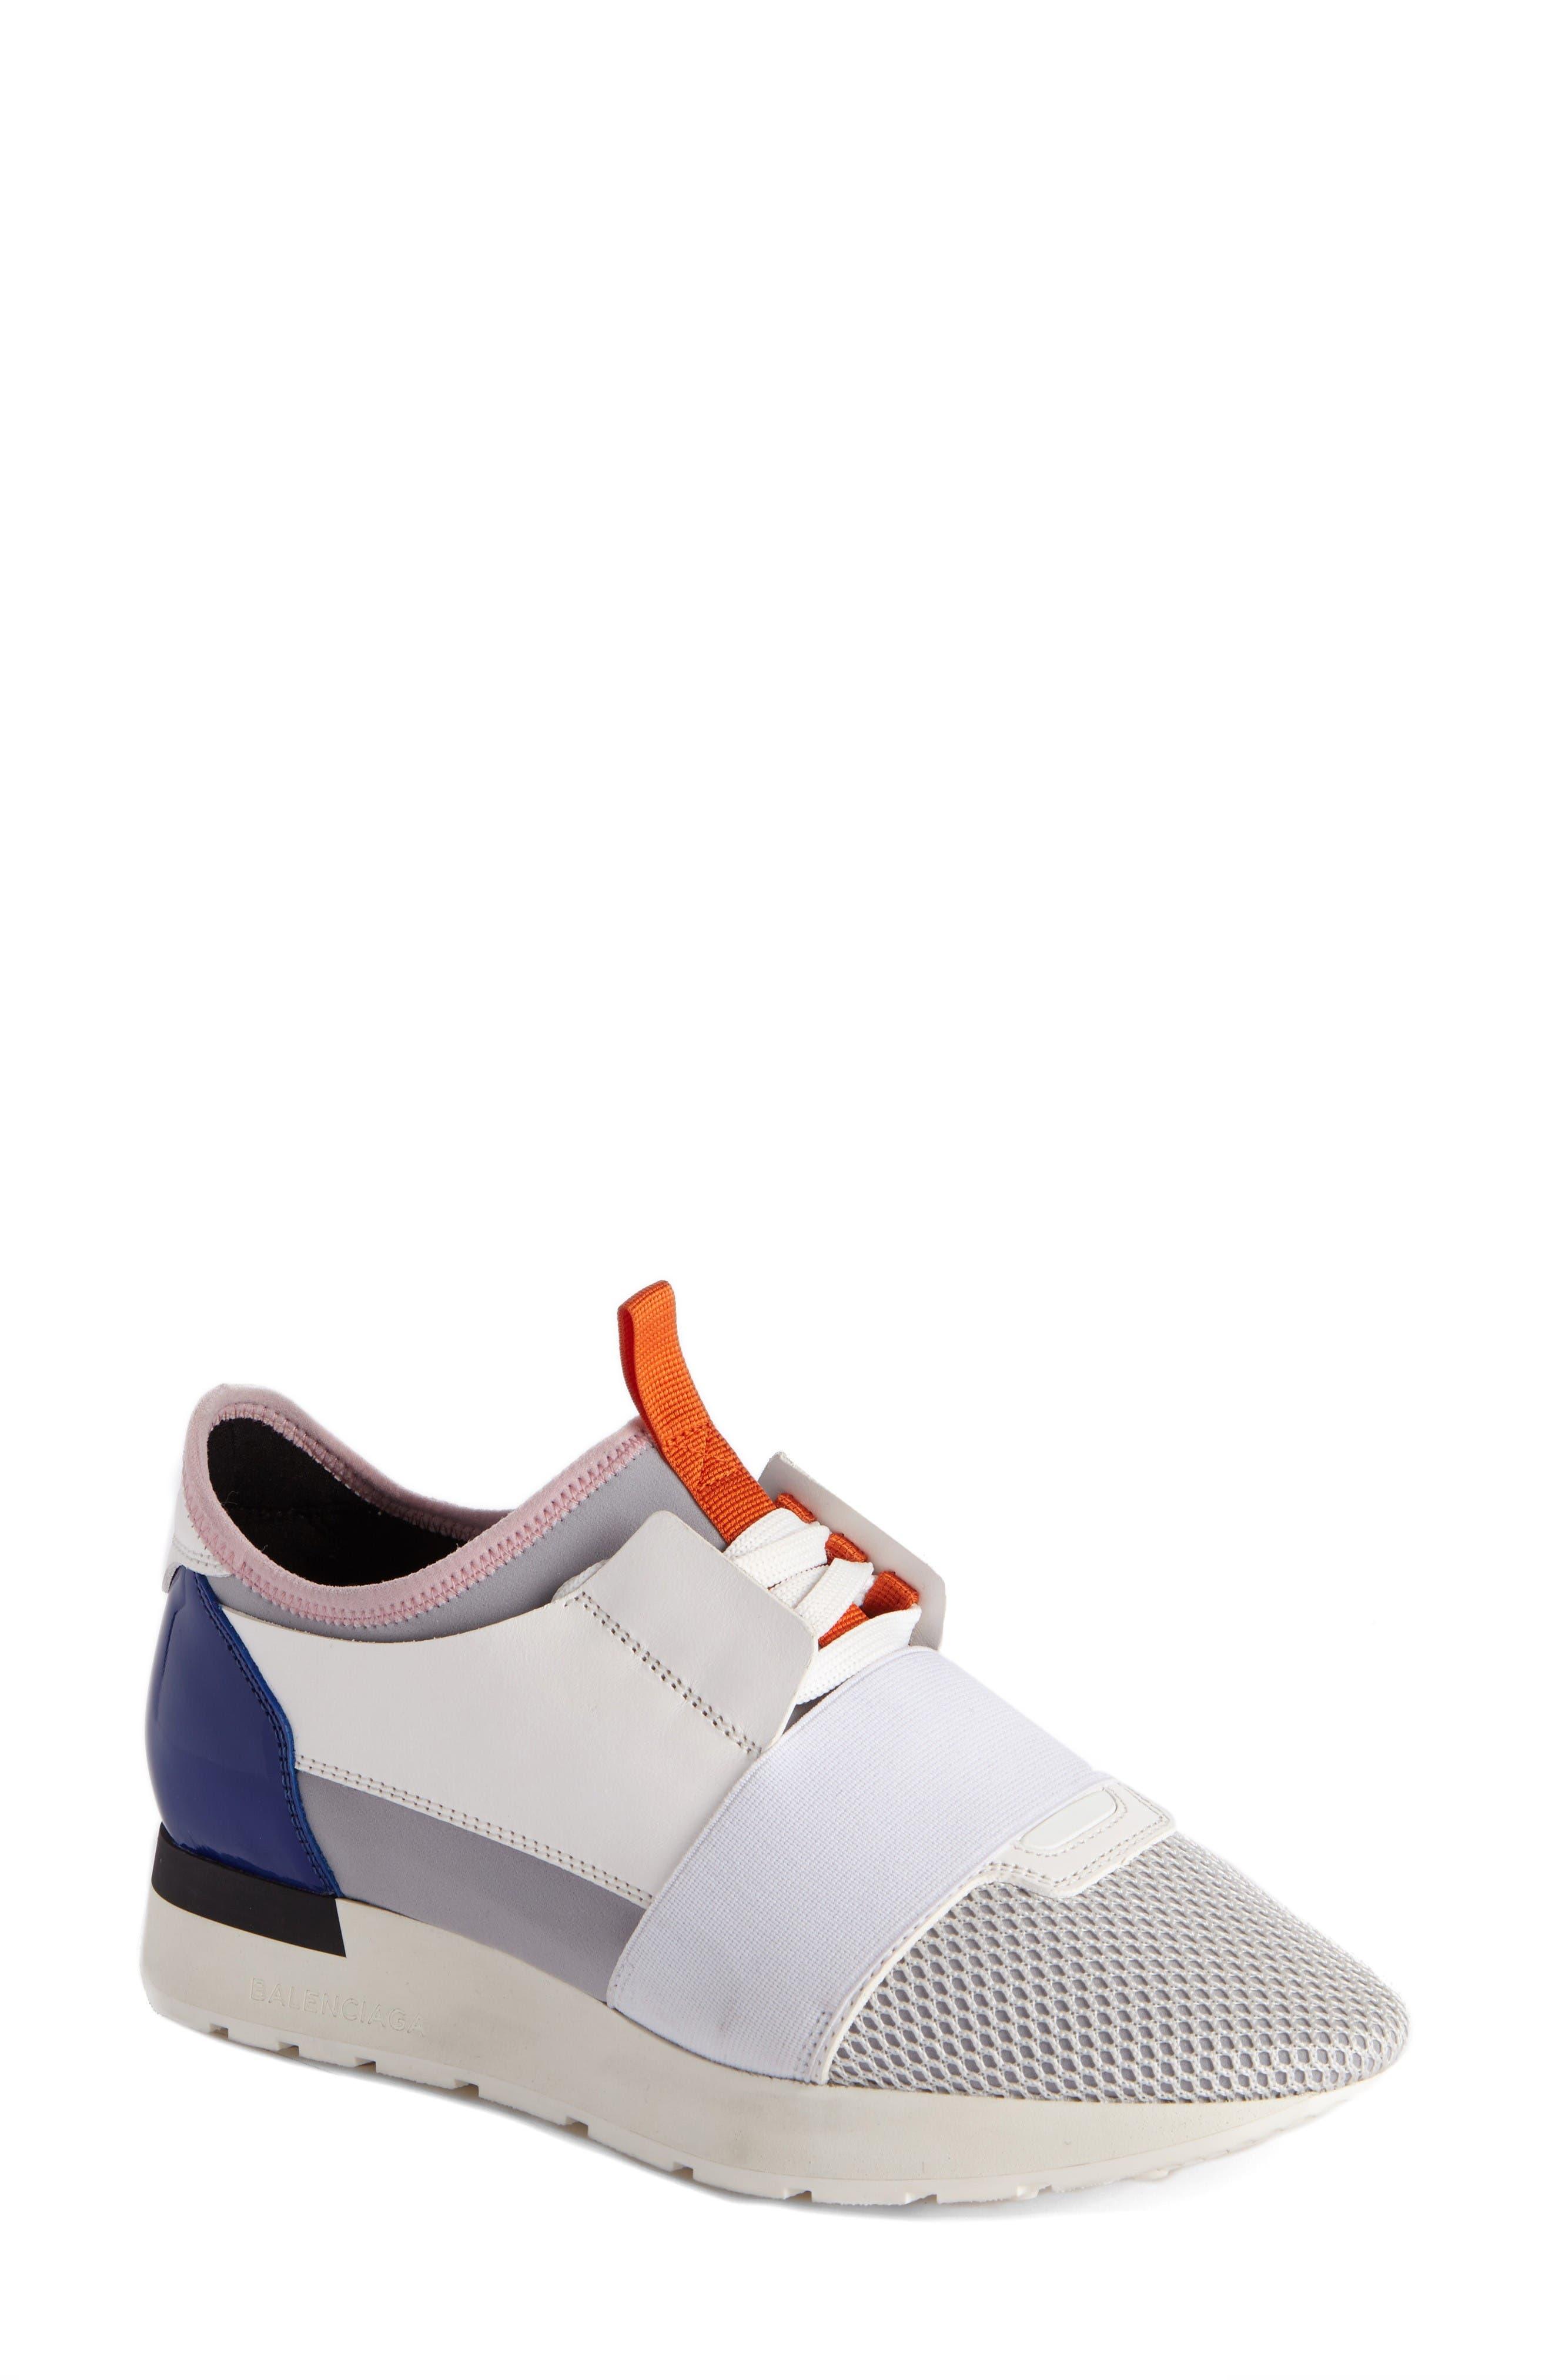 Main Image - Balenciaga Trainer Sneaker (Women)